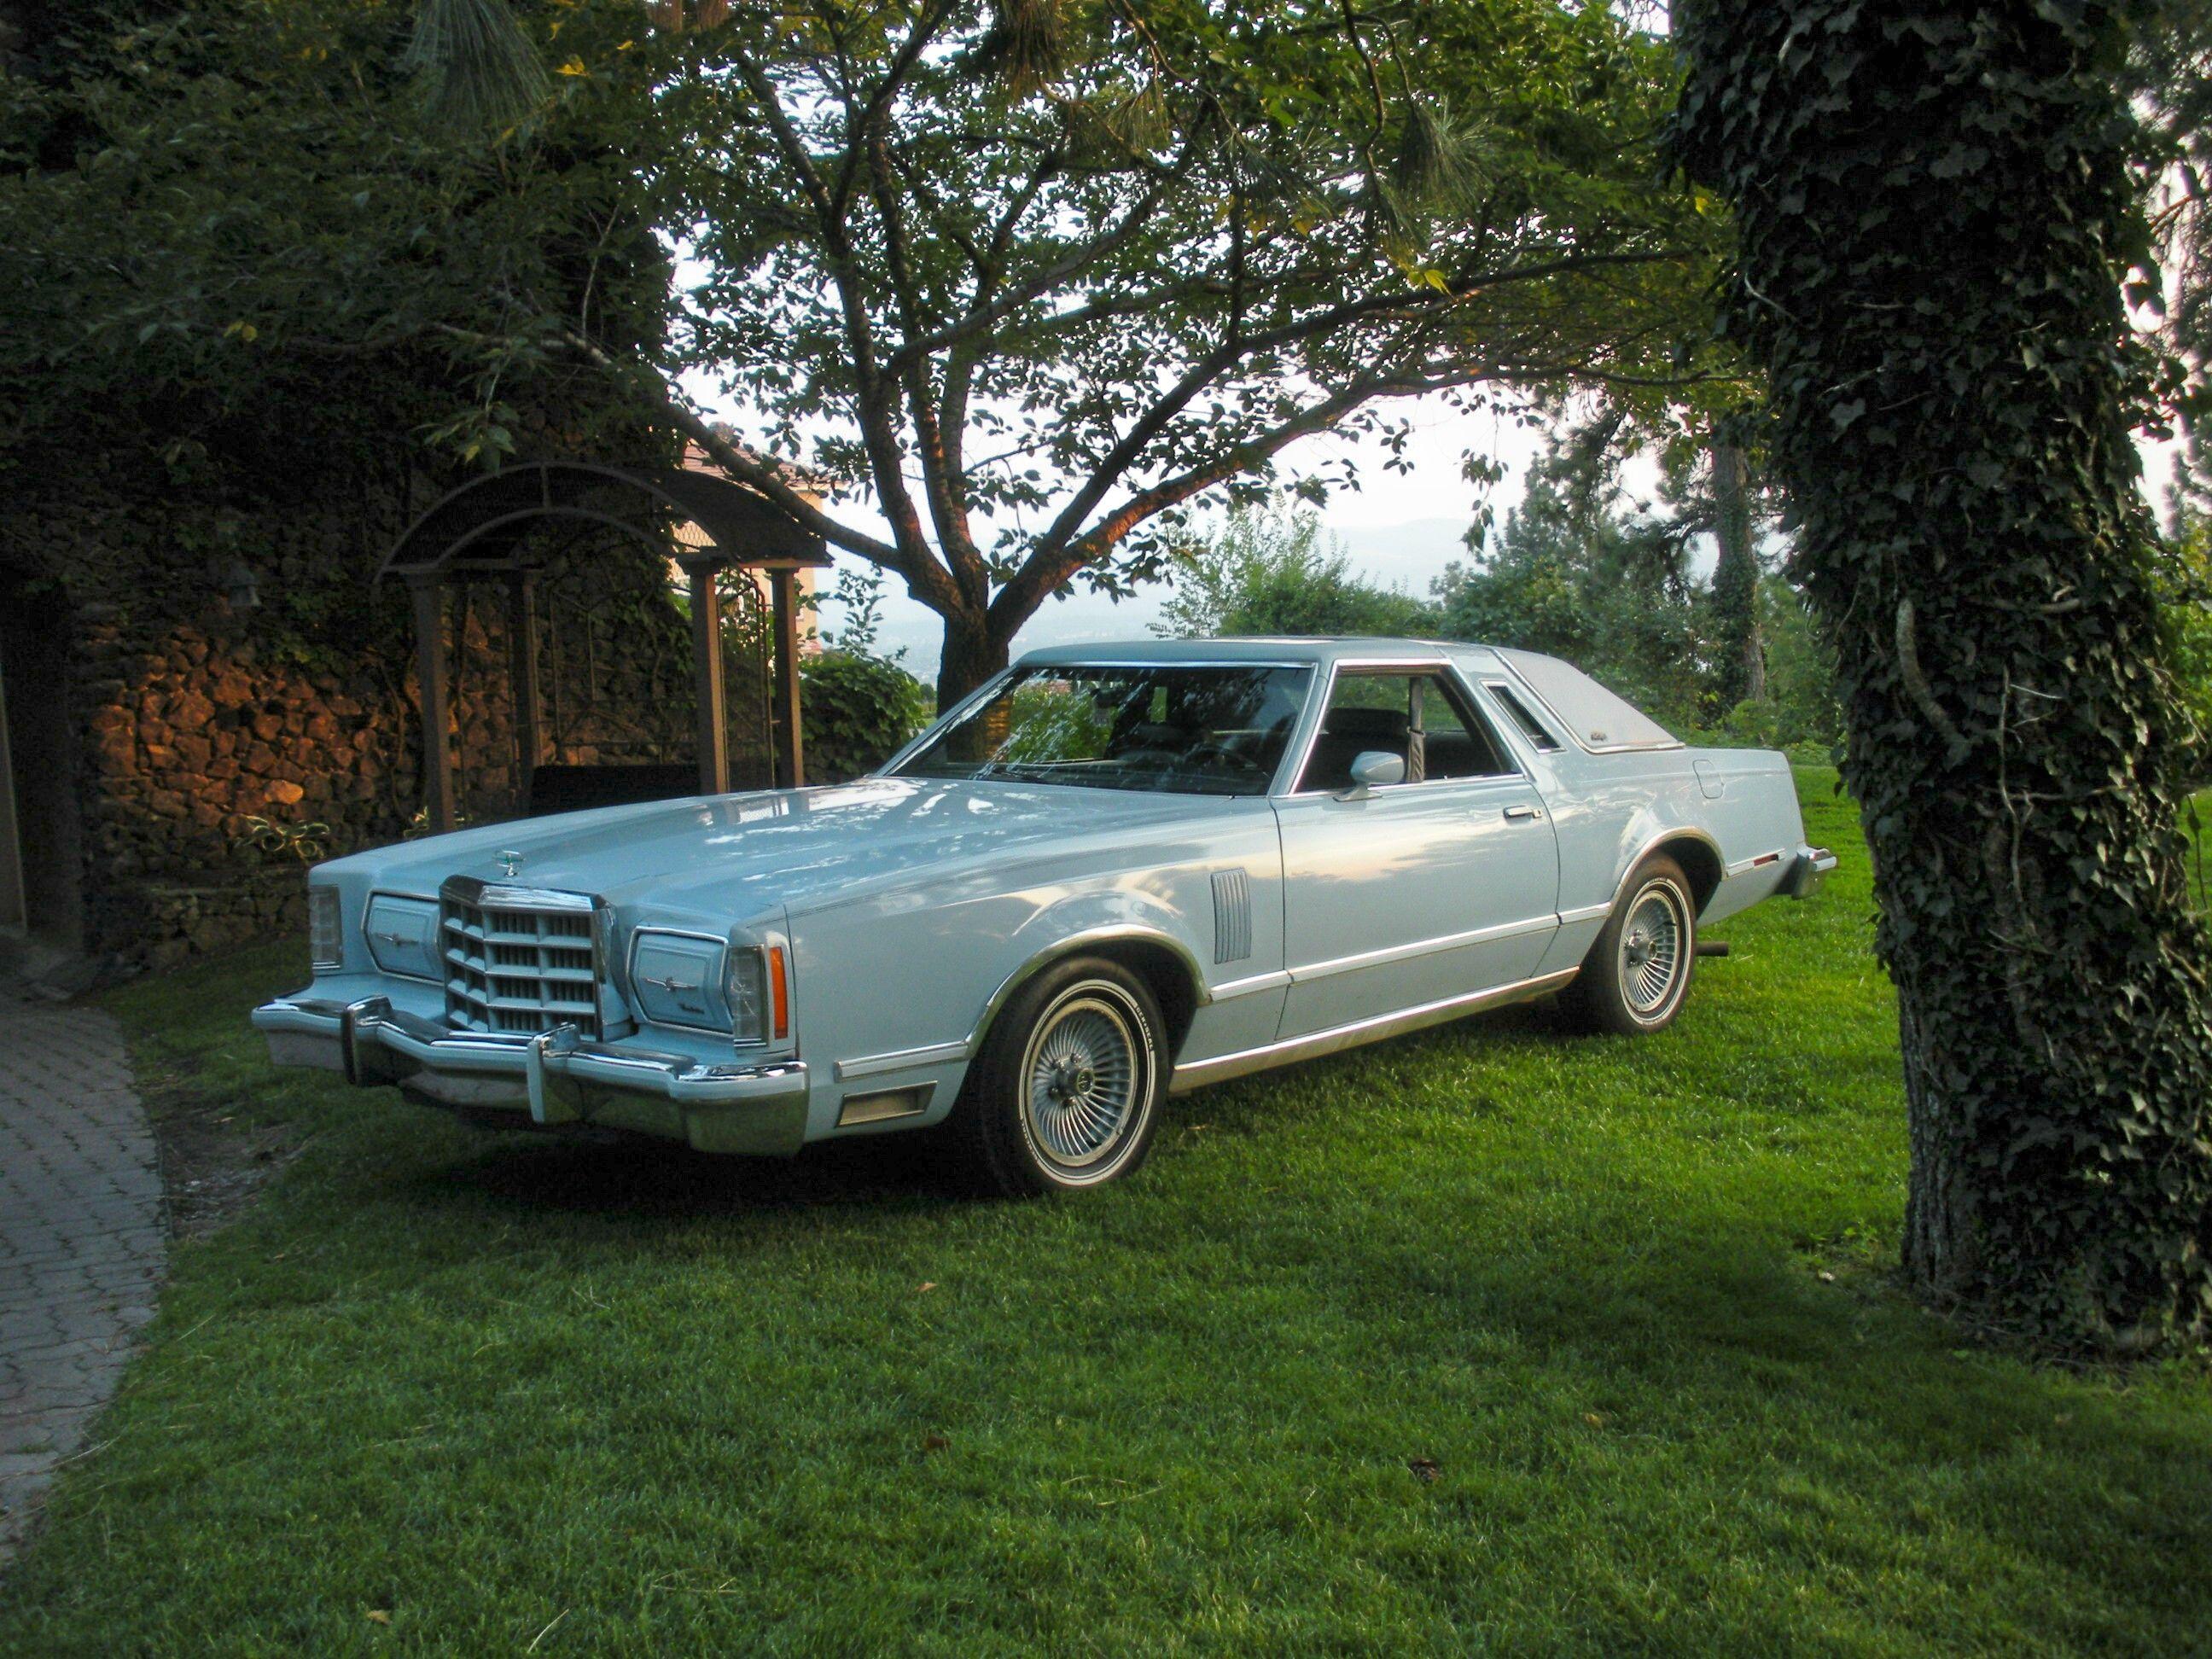 1979 Ford Thunderbird Heritage My Sweet Baby Blue! Ric u0026 Carlila Hughes & 1979 Ford Thunderbird Heritage My Sweet Baby Blue! Ric u0026 Carlila ... markmcfarlin.com